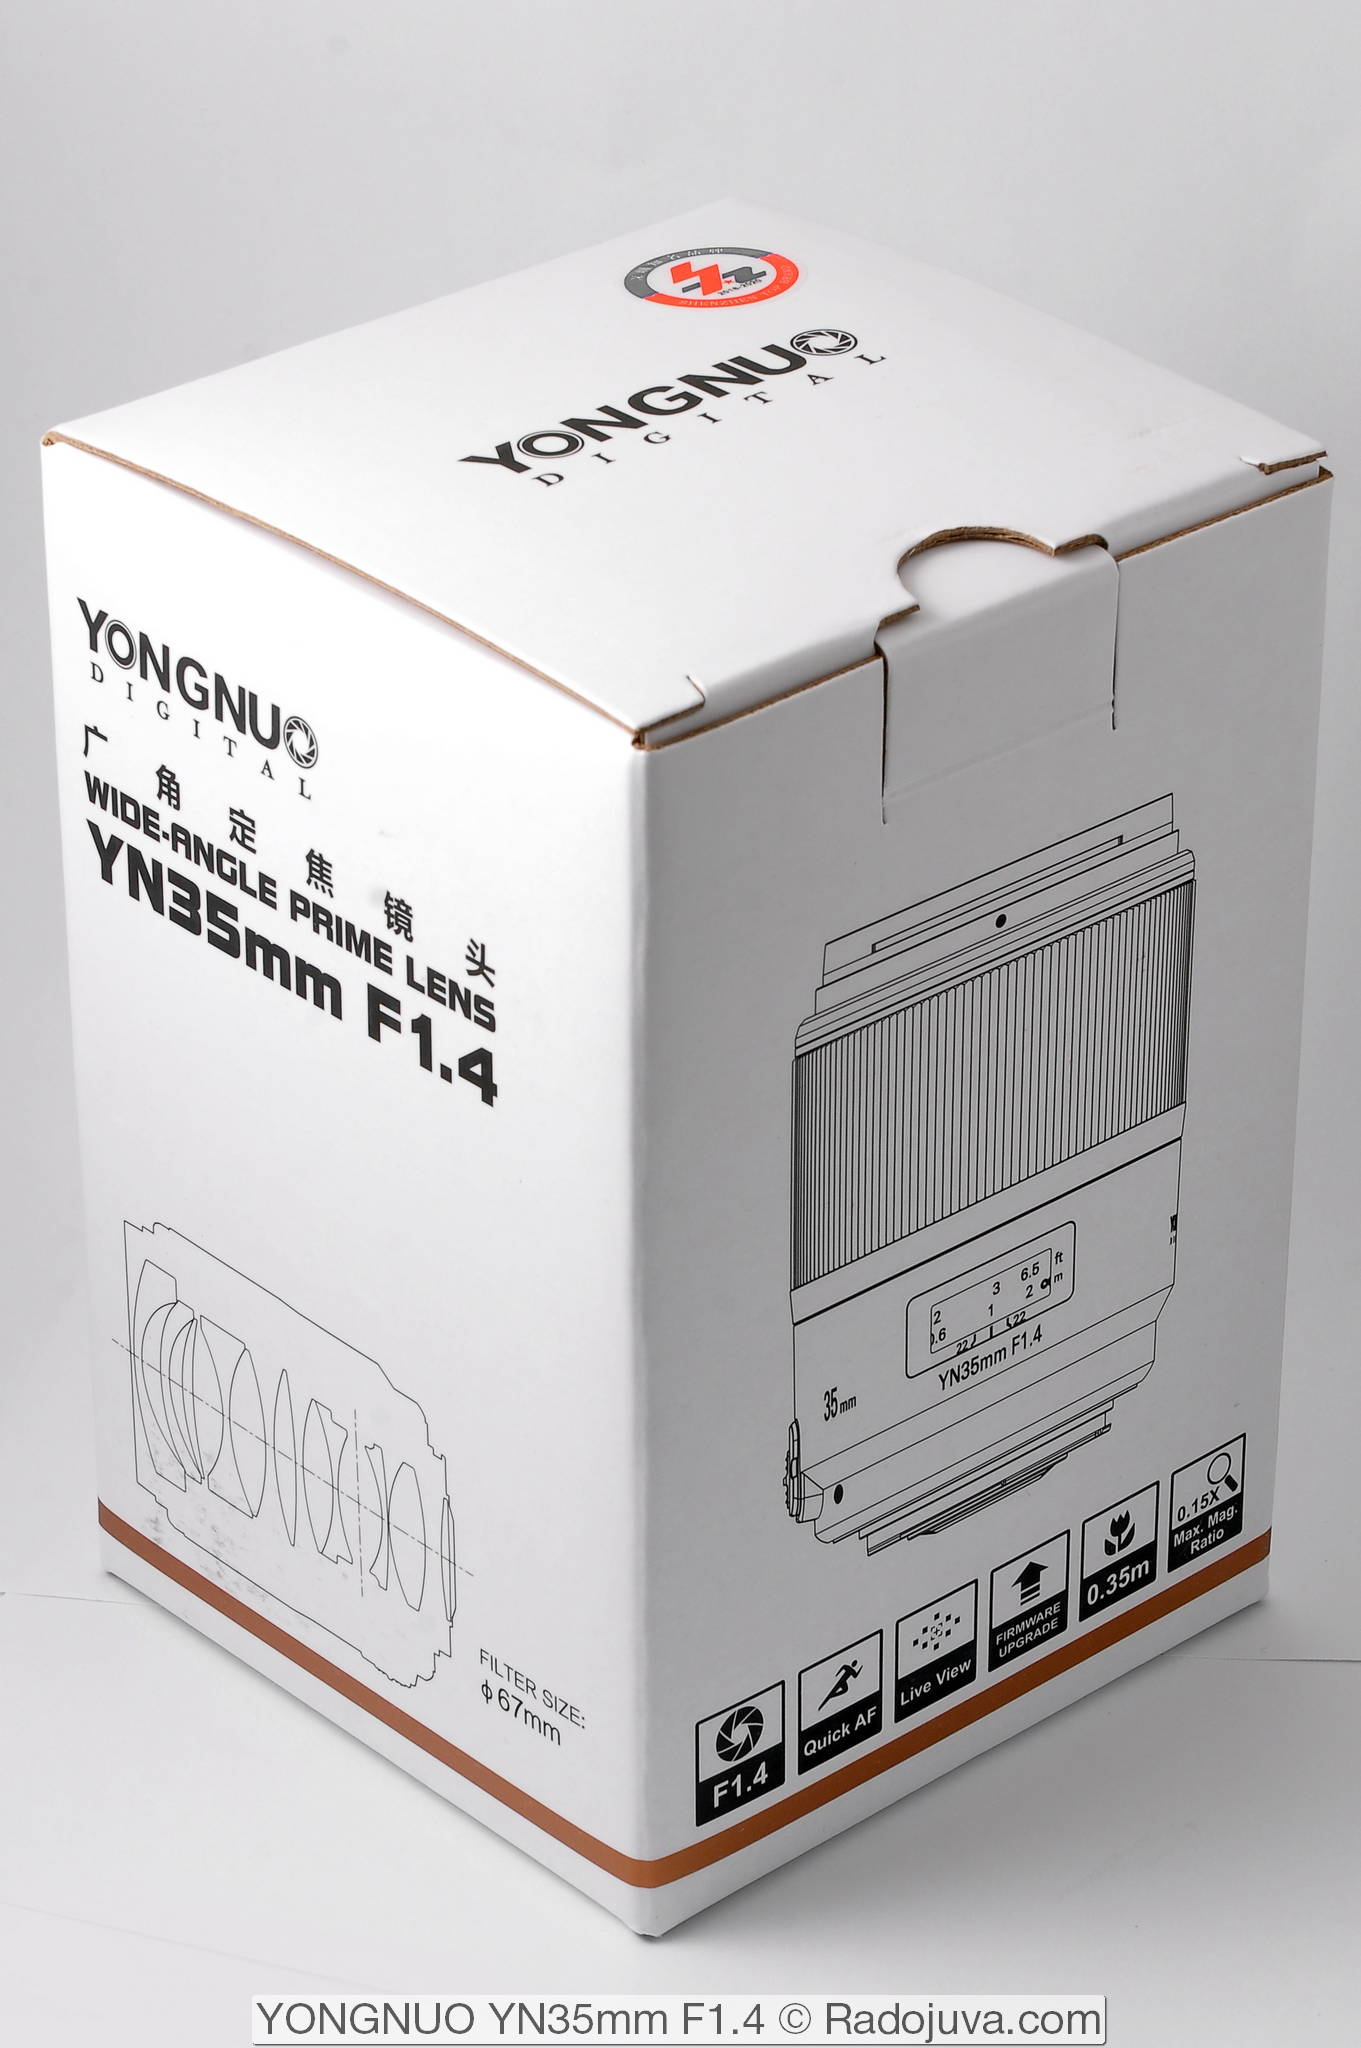 Коробка от YONGNUO YN35mm F1.4